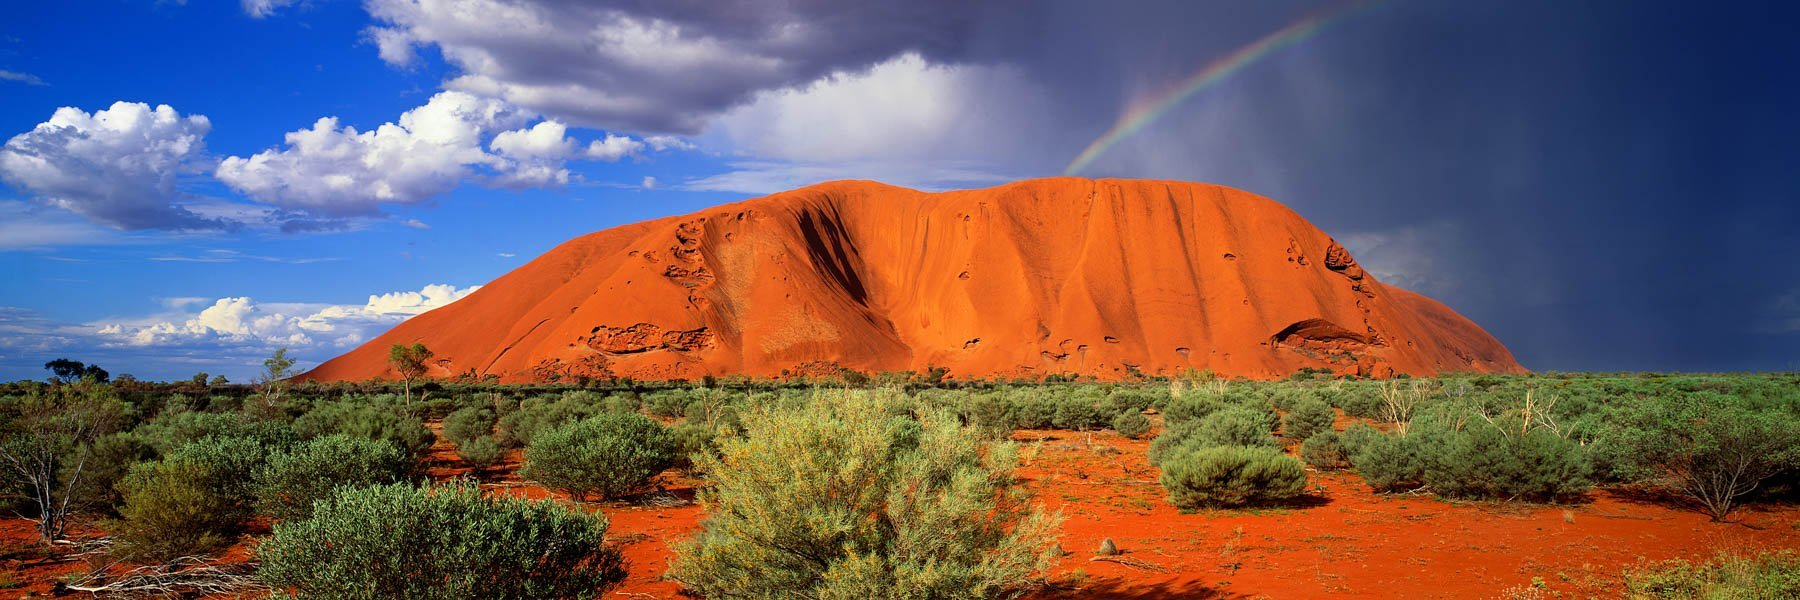 Rain showers over Uluru, NT, Australia.